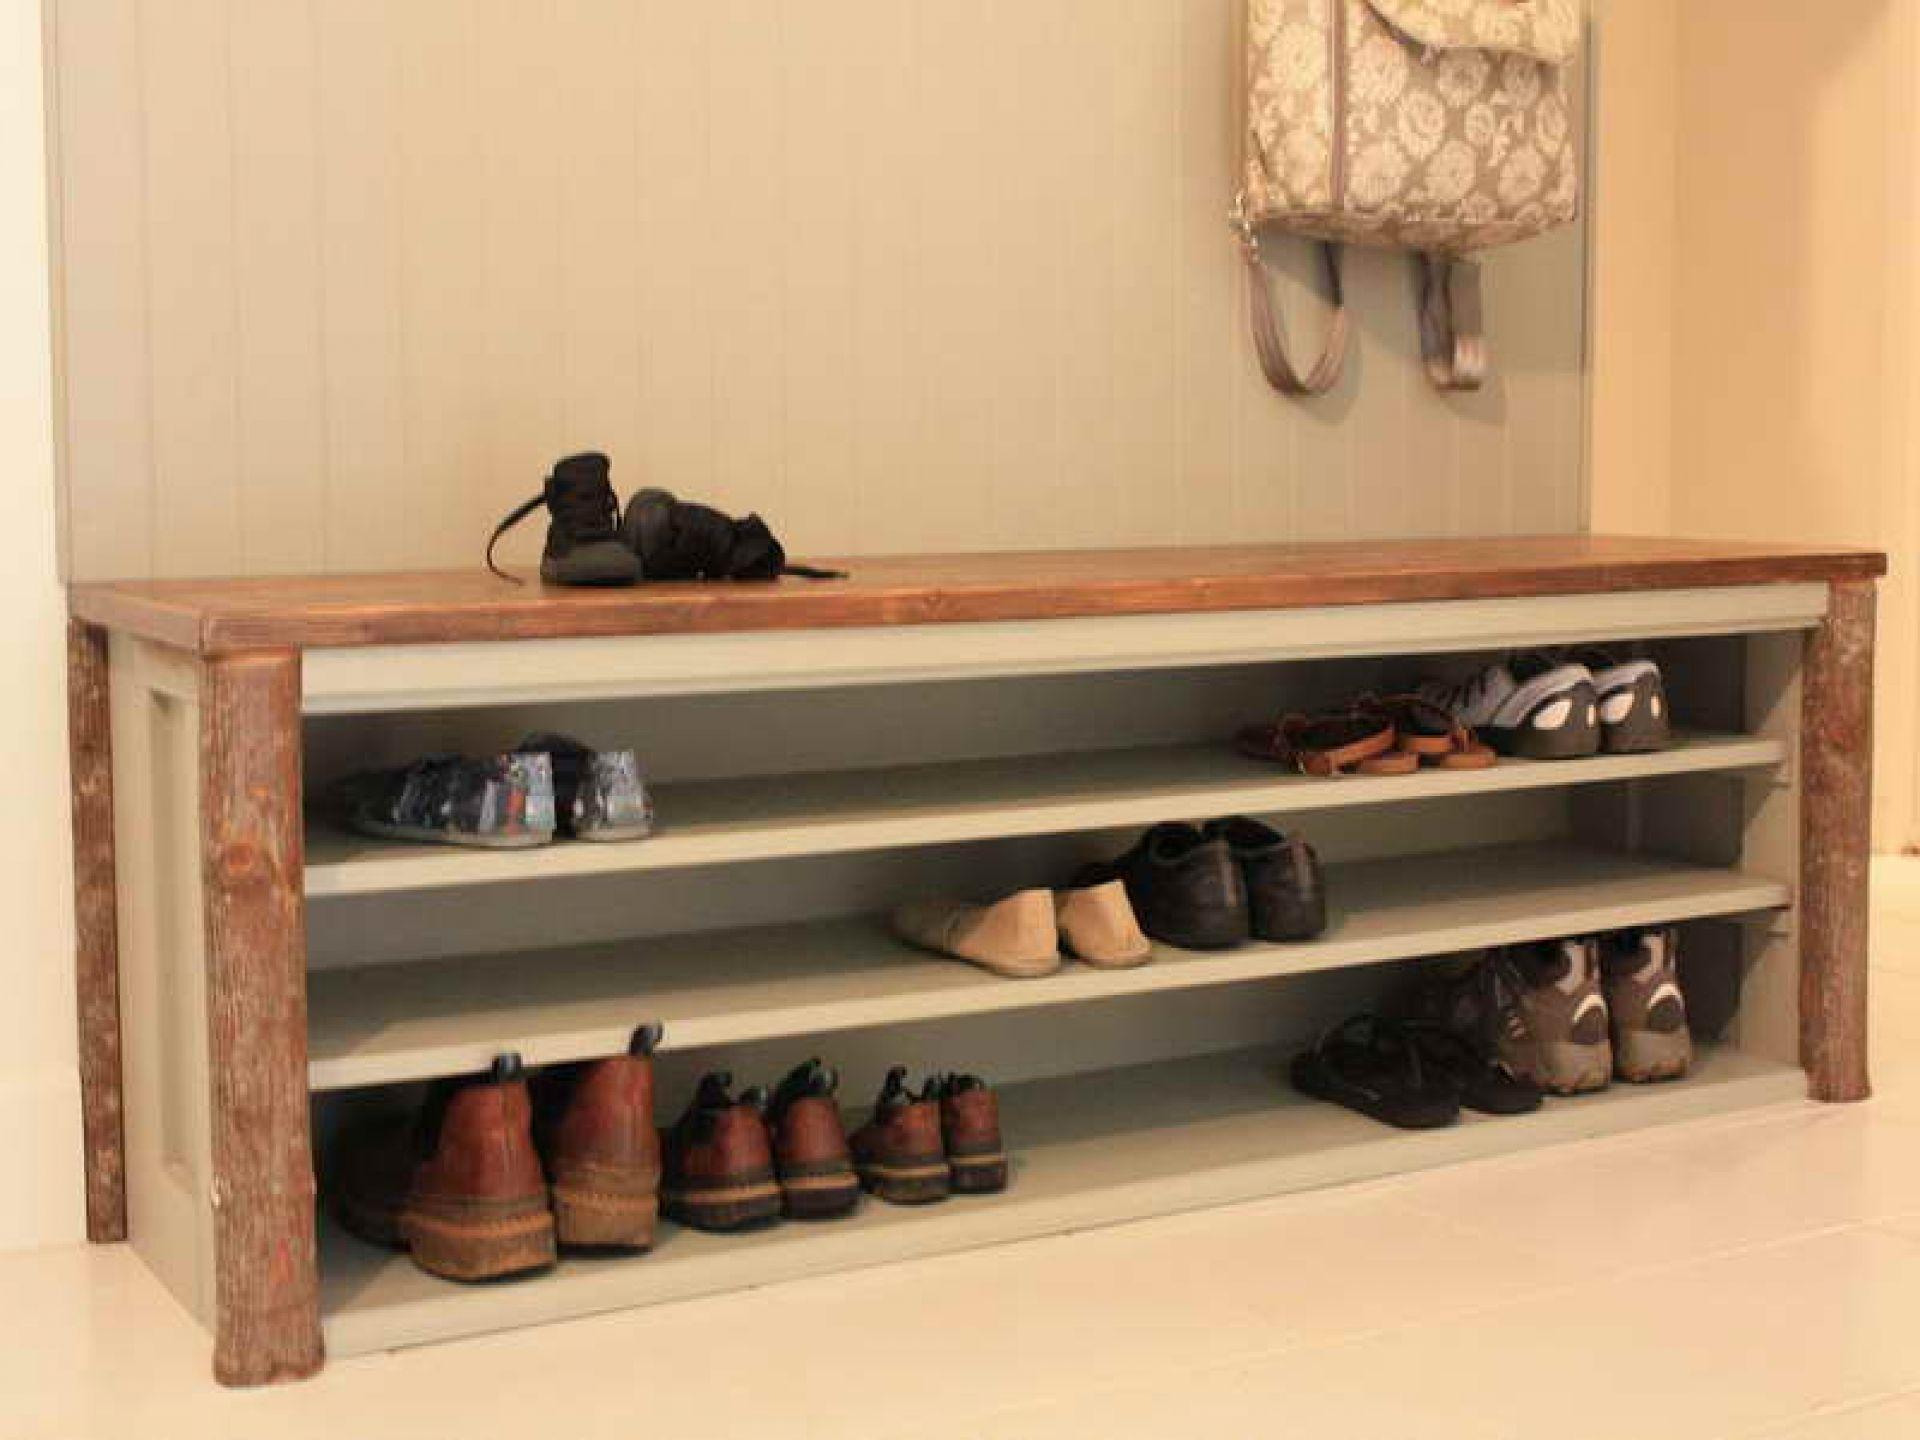 Mudroom Shoe Storage Google Search Banc Avec Rangement Chaussures Rangement A Chaussures Rangement Chaussures